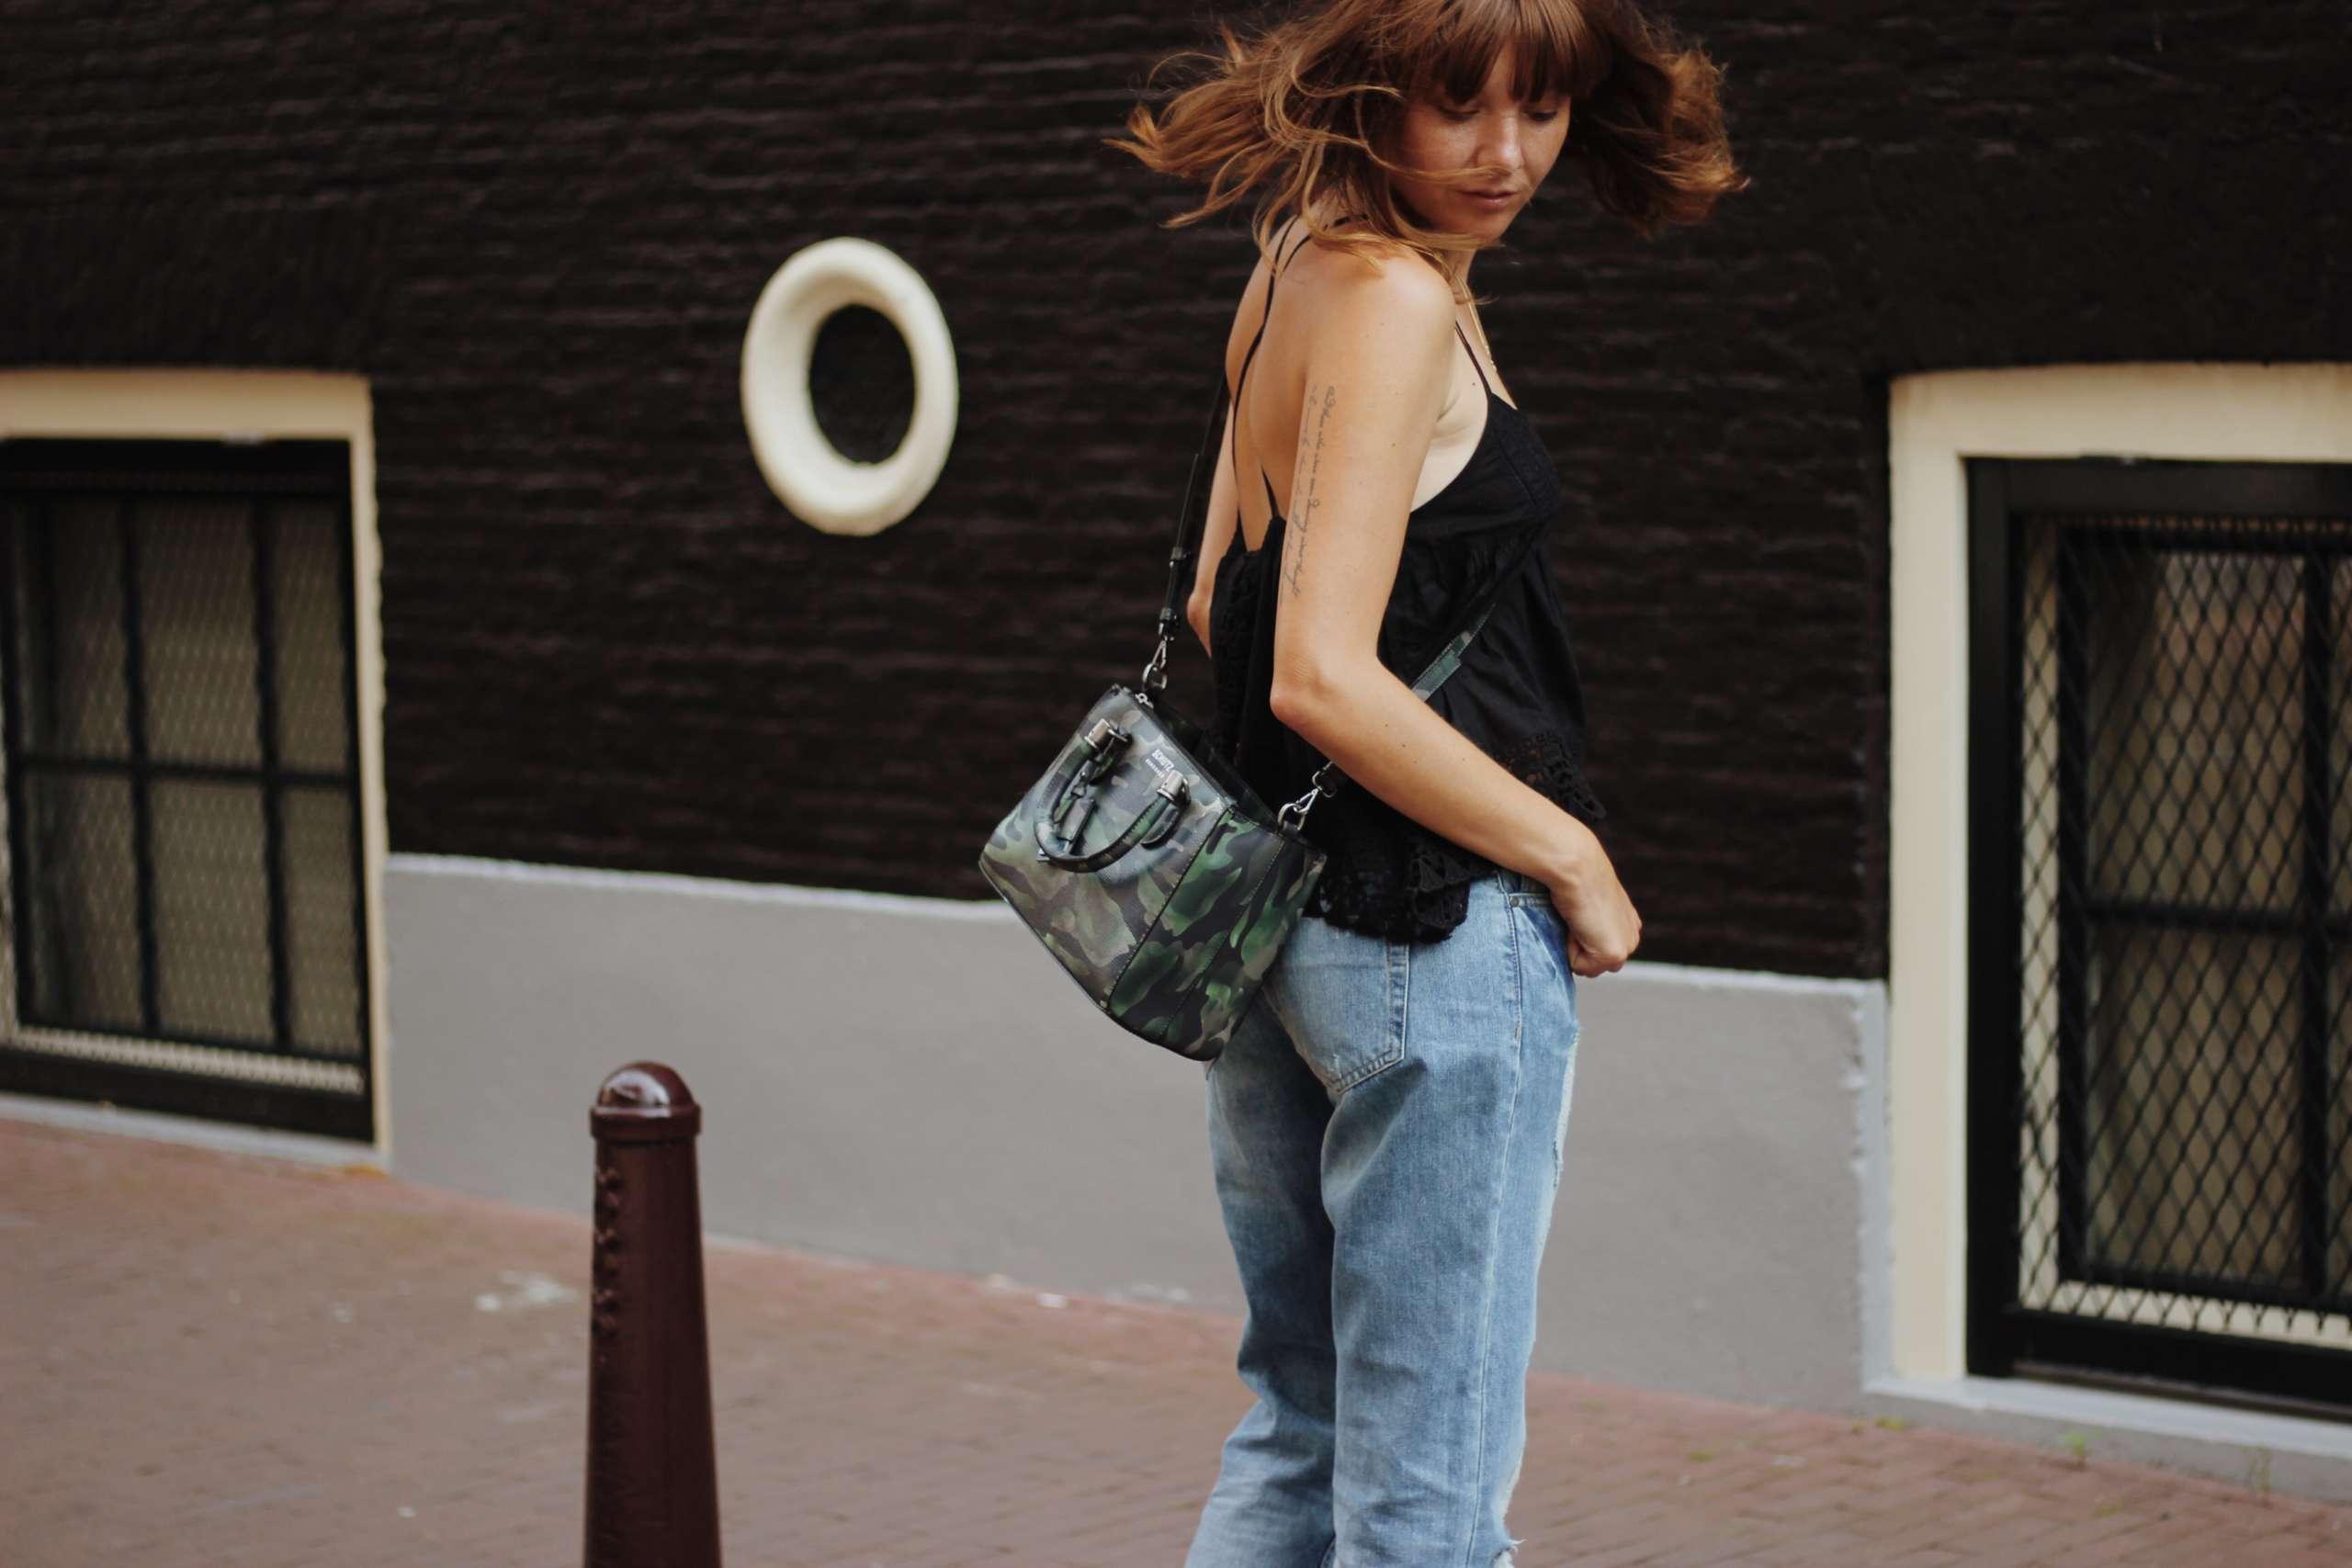 bag-camouflage-Celine-wedge-dricoper-na-kd-republica-moda-schutz